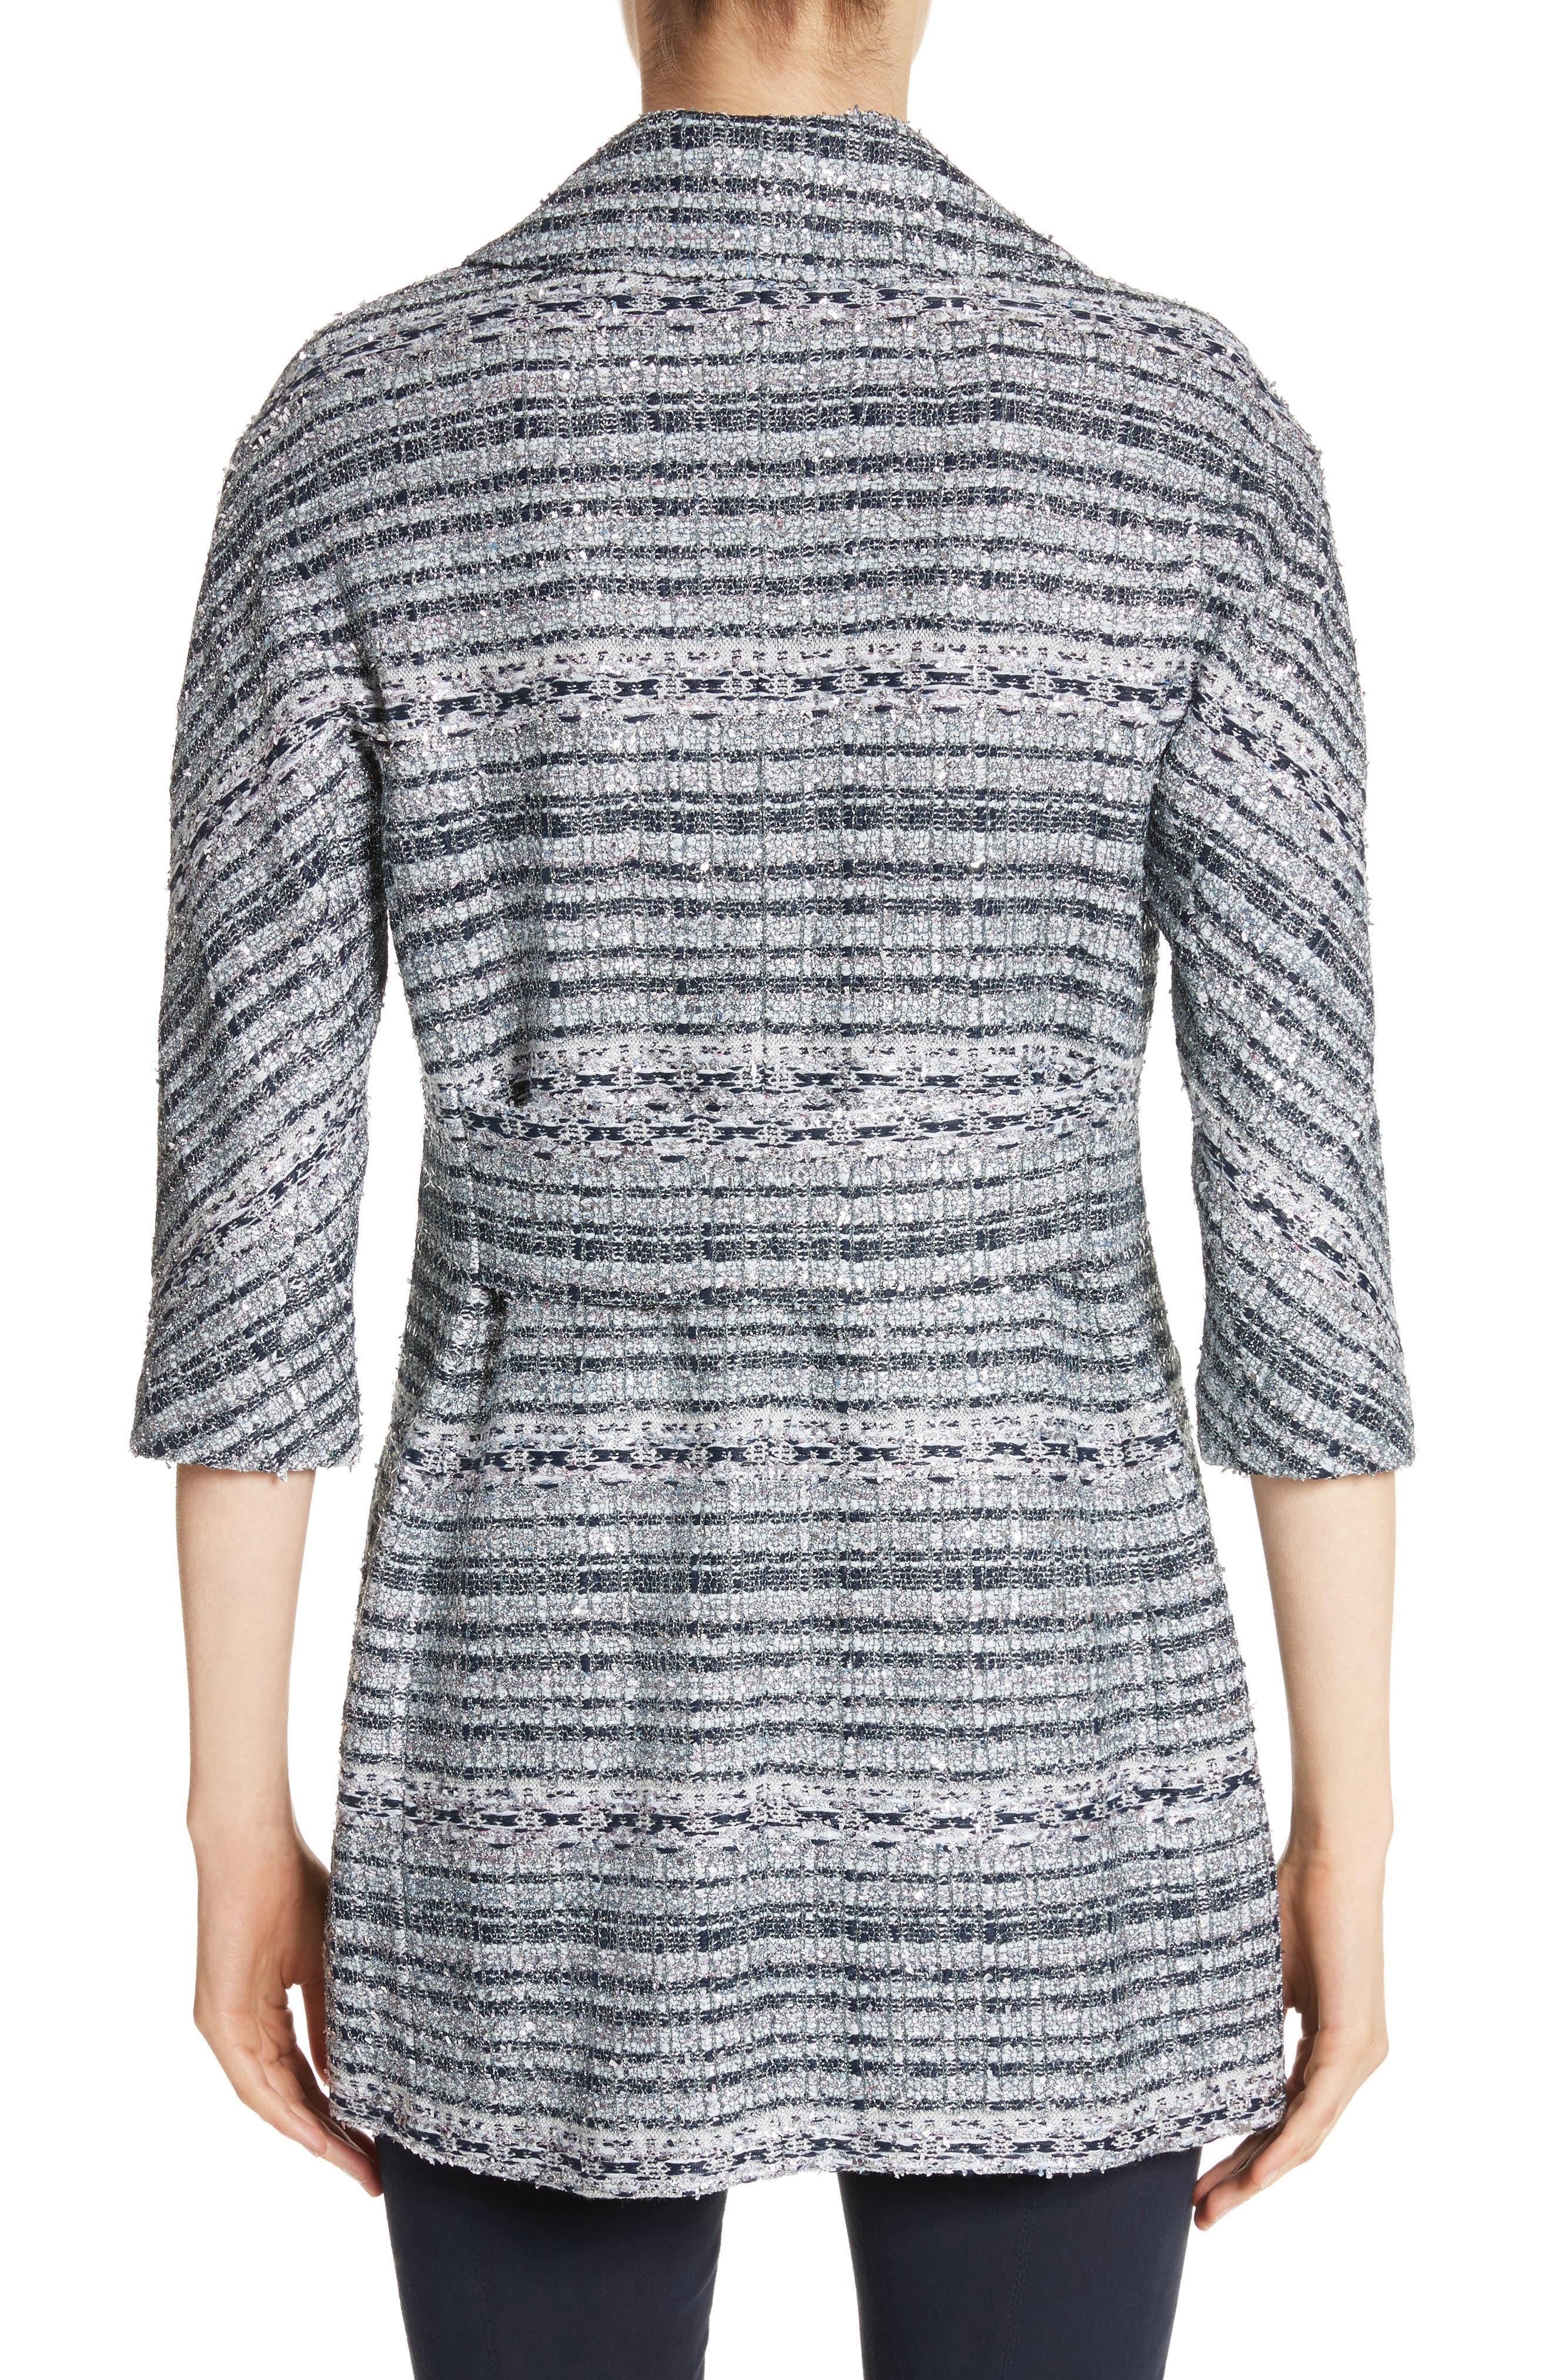 Lacquered Metallic Ribbon Knit Jacket,                             Alternate thumbnail 2, color,